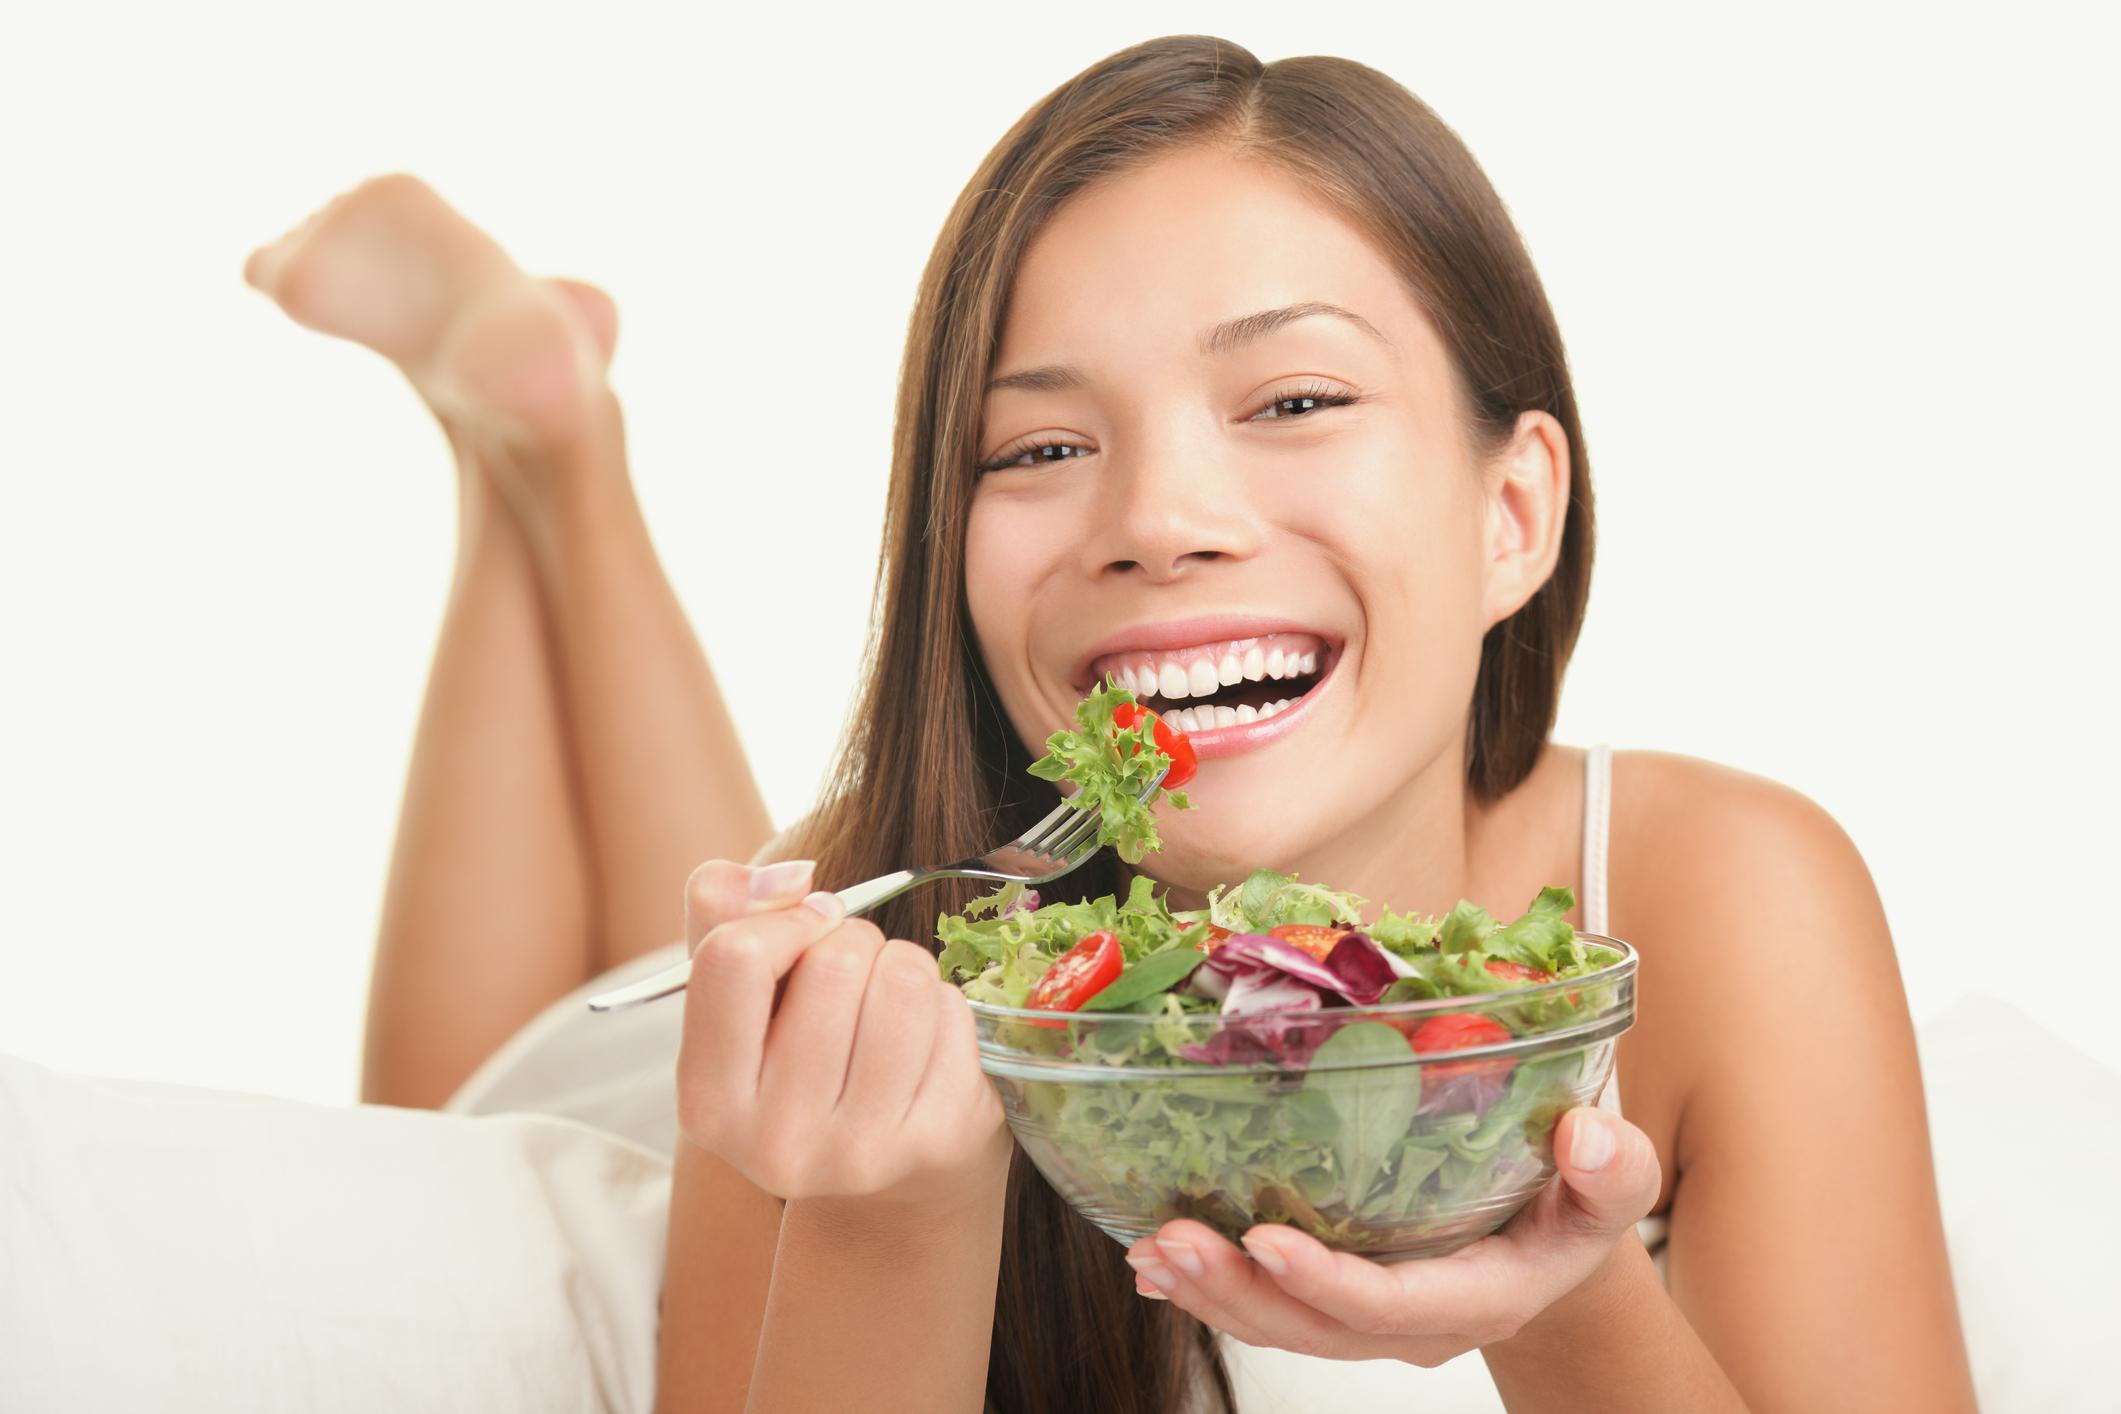 eating salad.jpg